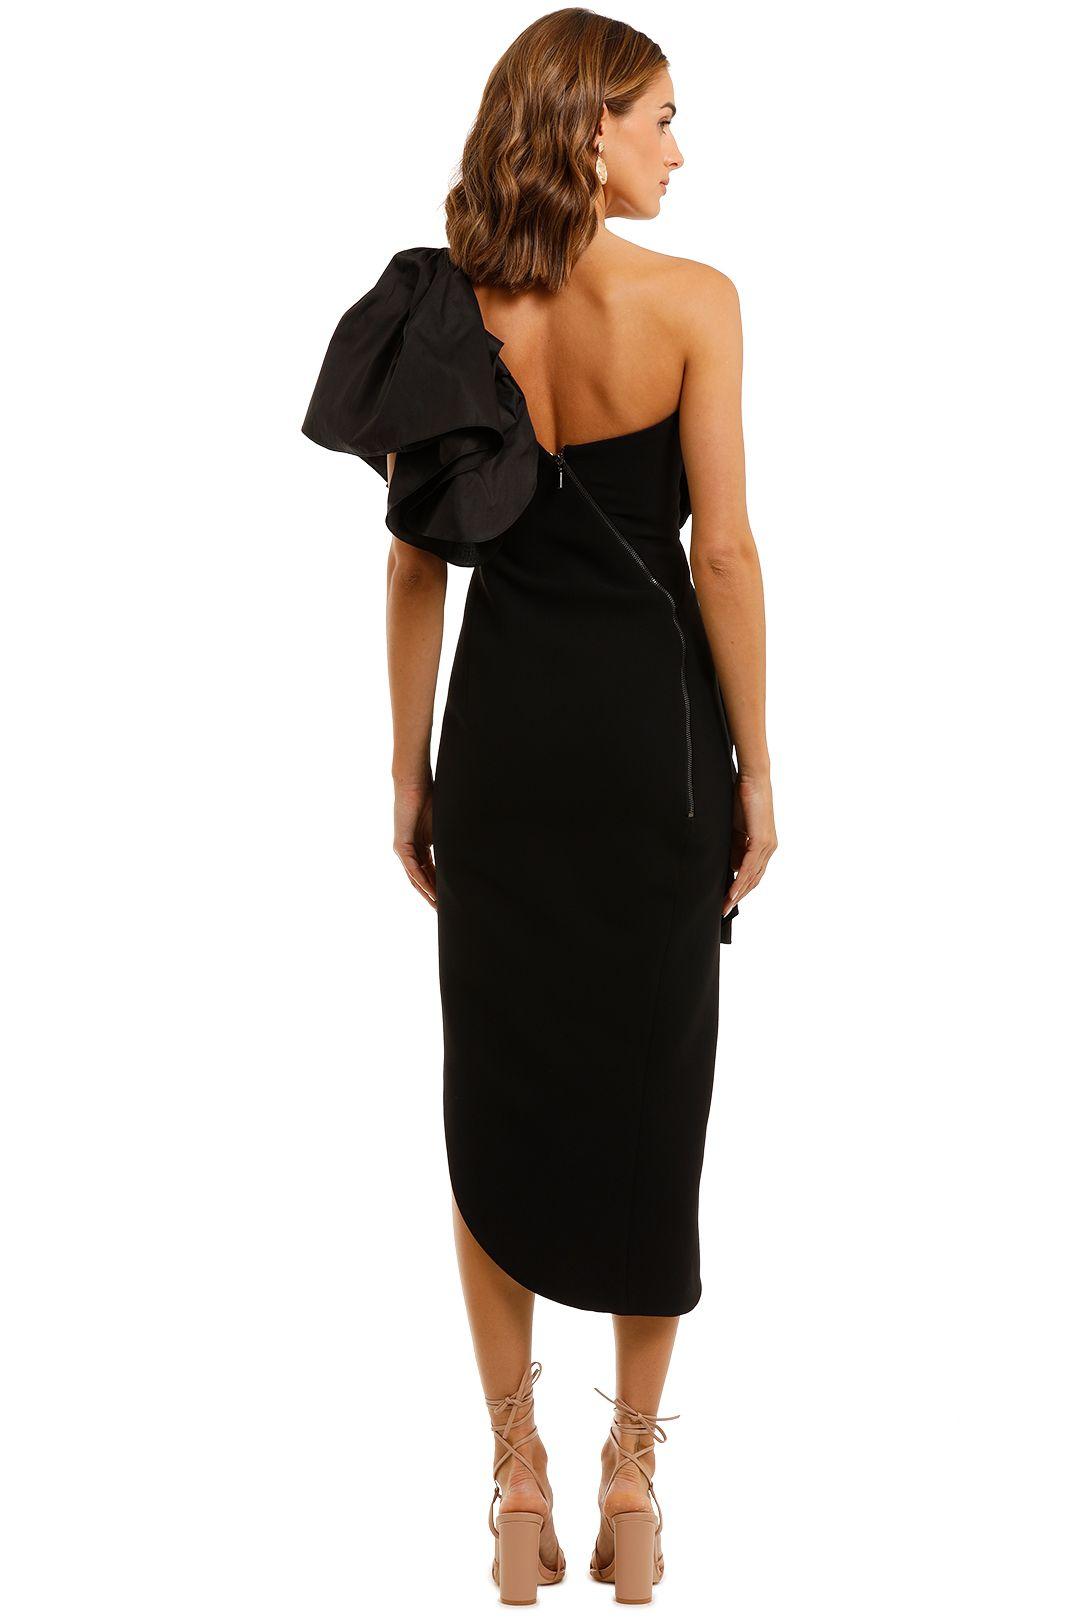 Maticevski Attentive Ruffle Dress One Shoulder